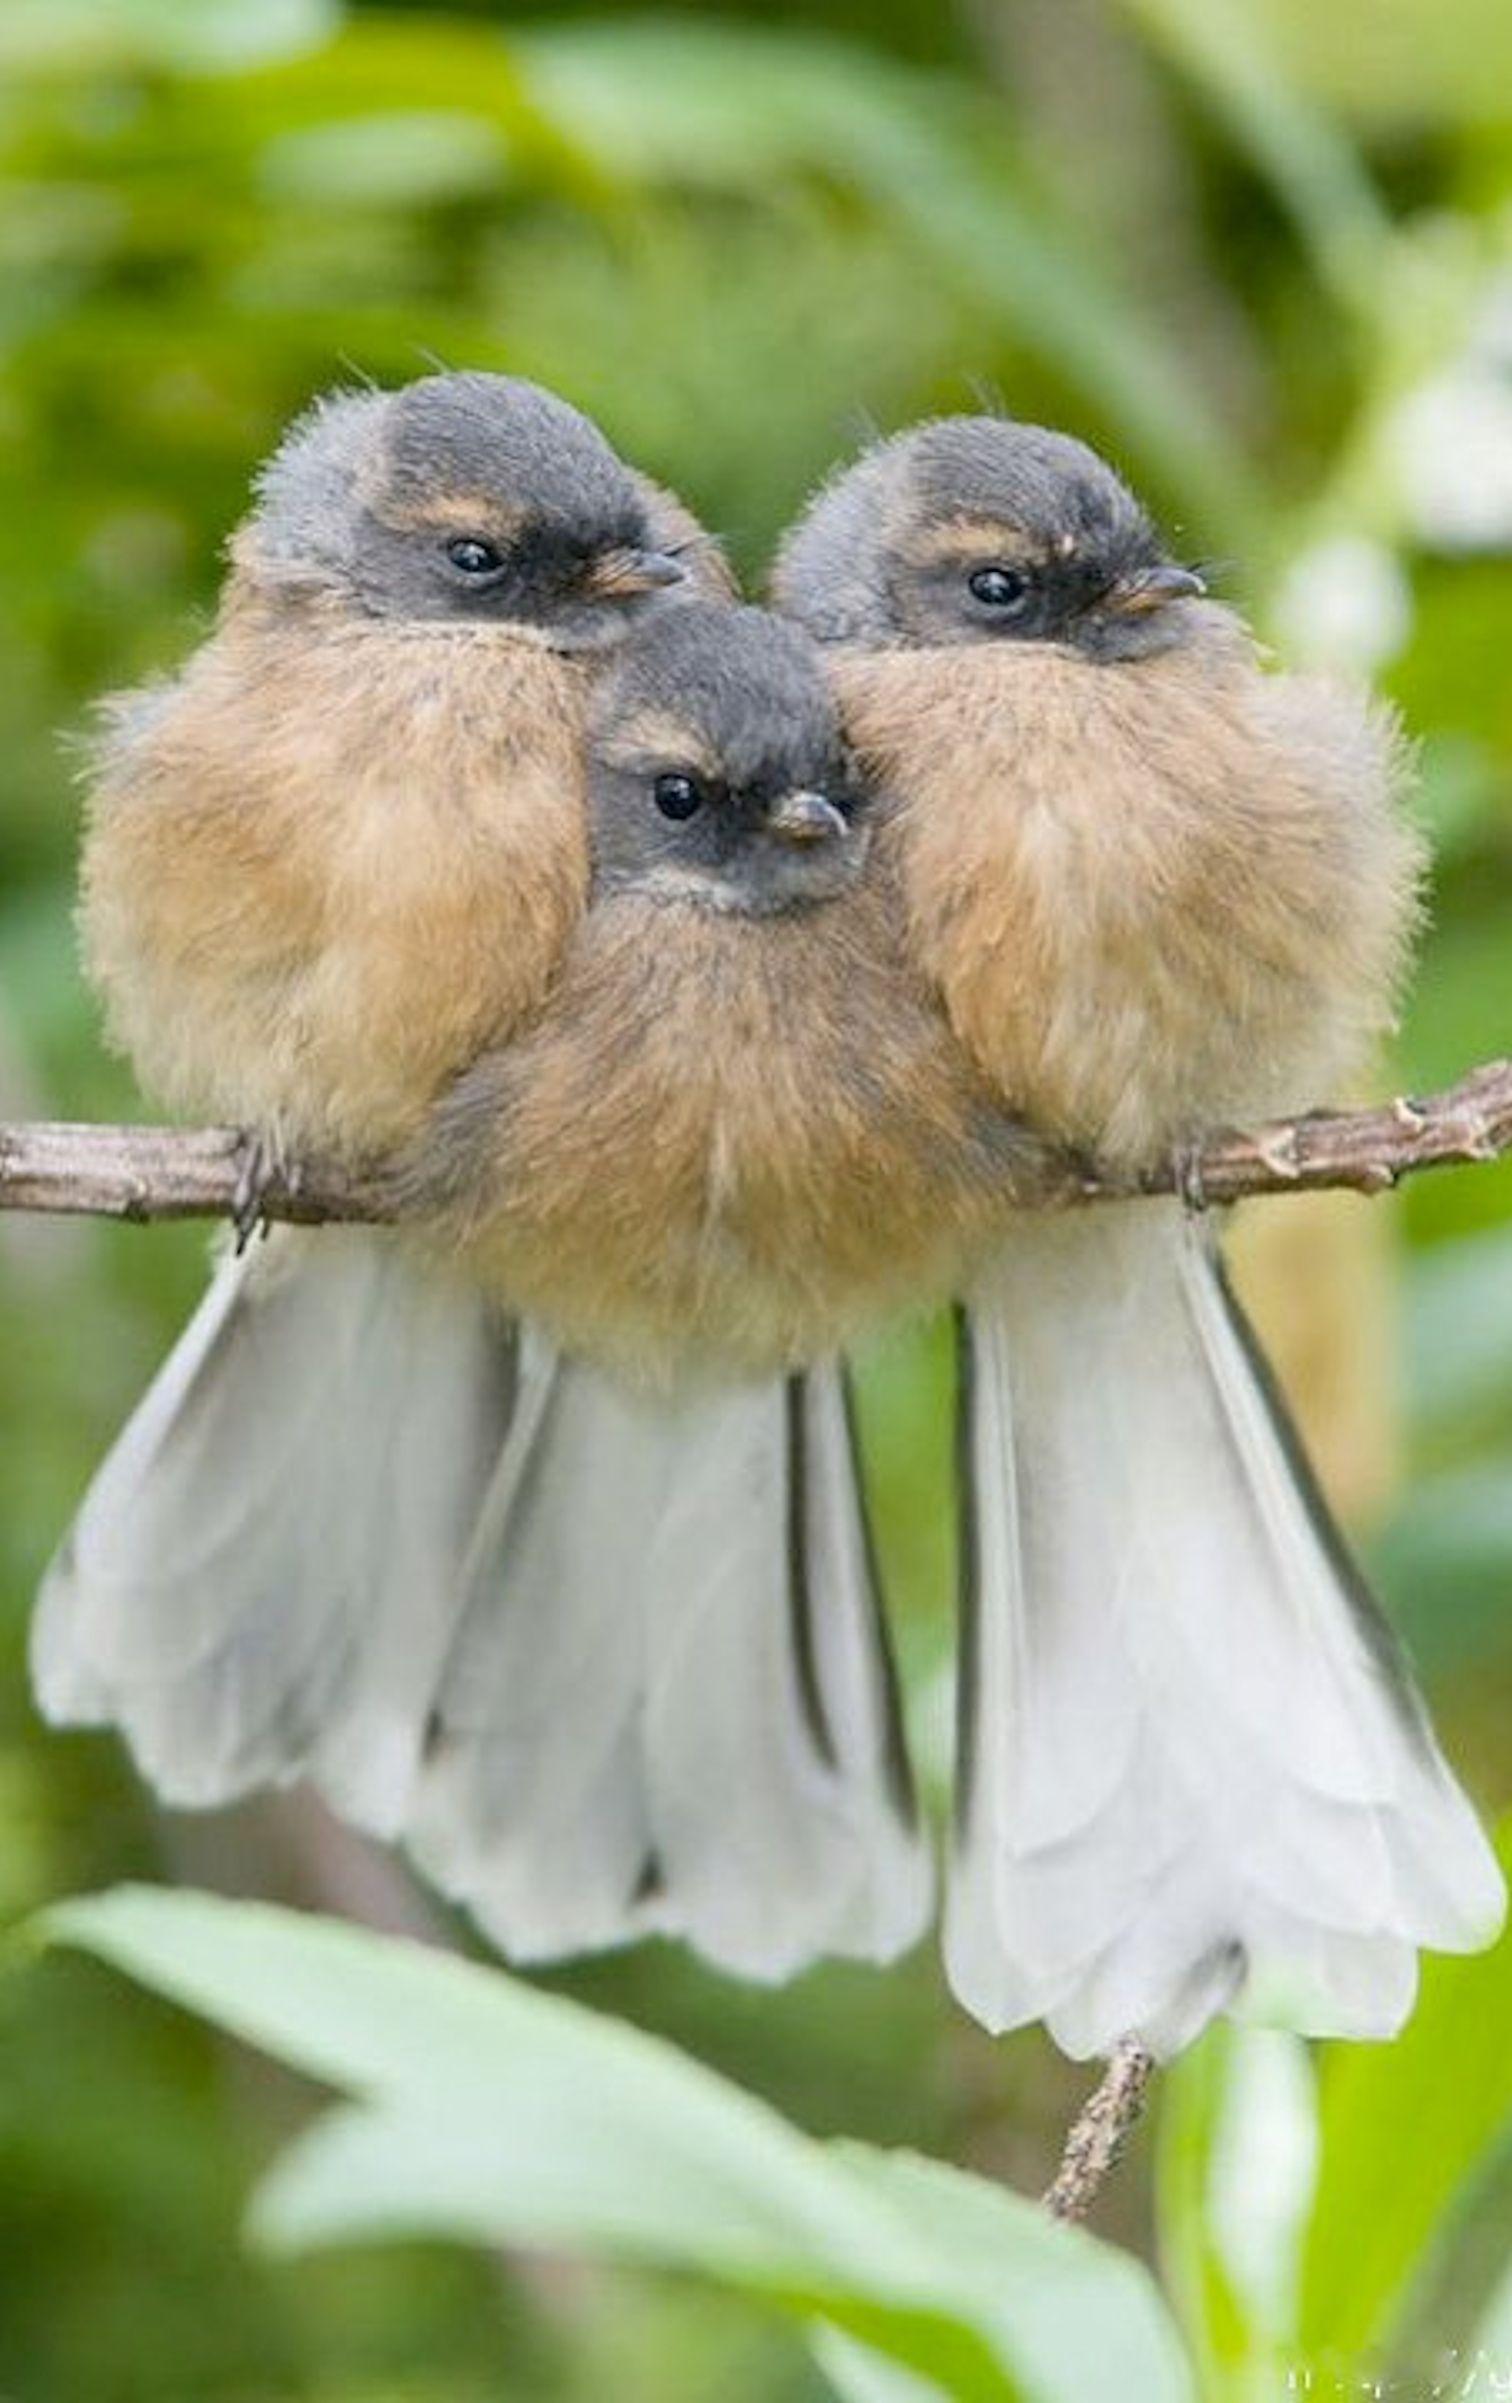 Cute Photos Of Birds Huddling Together